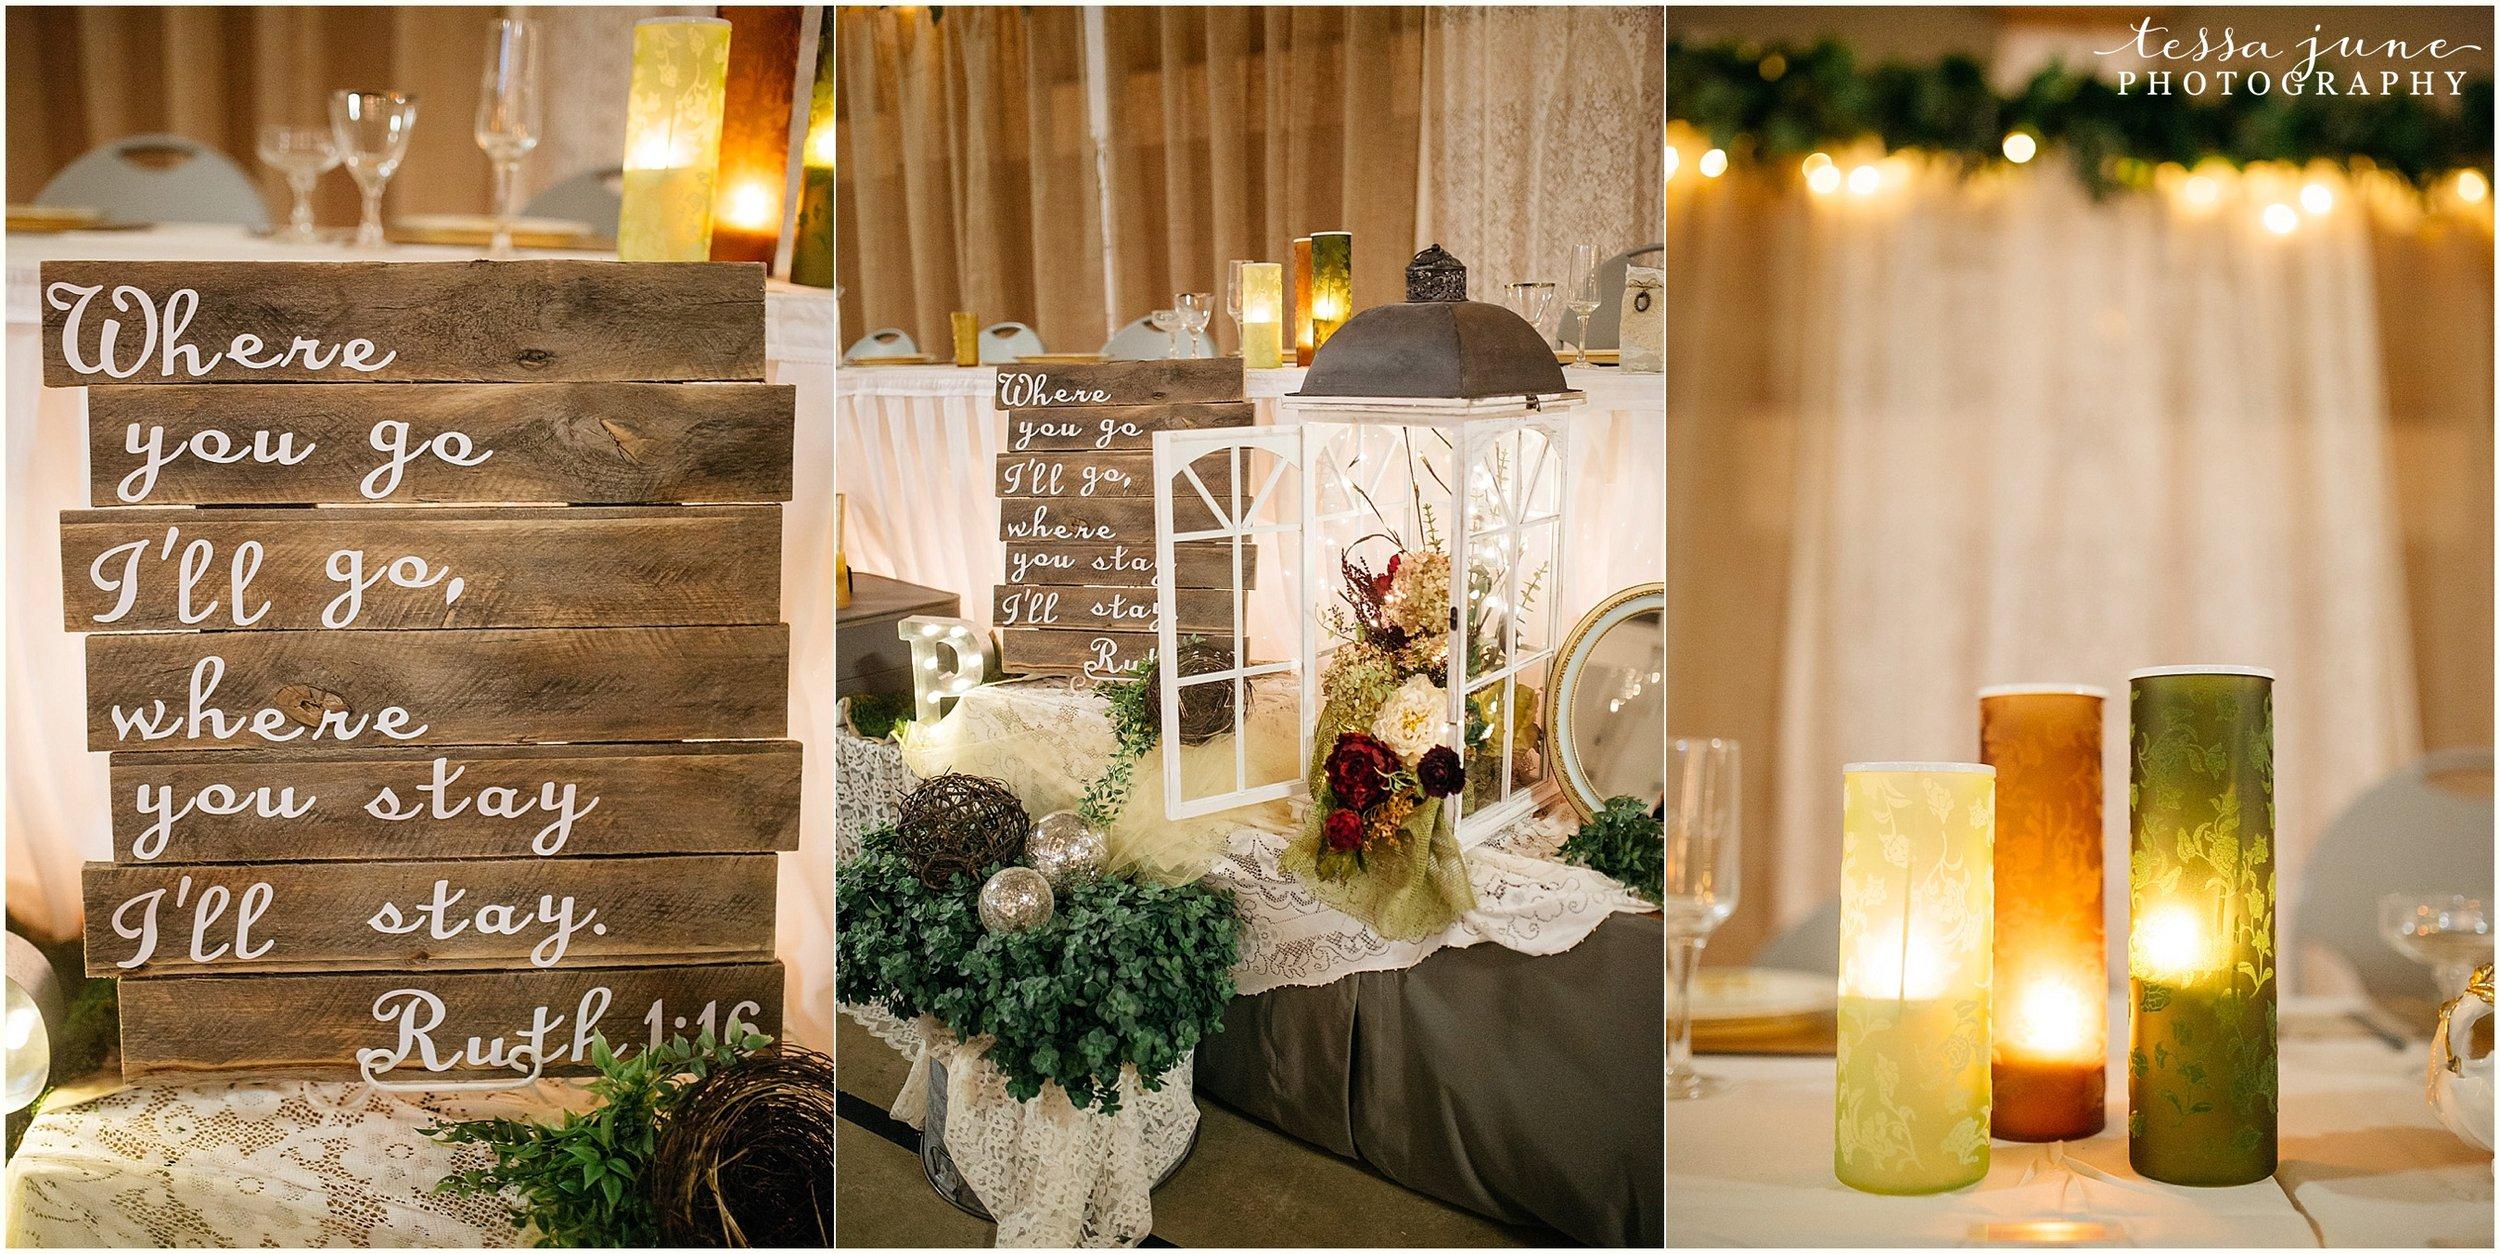 bohemian-minnesota-wedding-mismatched-bridesmaid-dresses-waterfall-st-cloud-tessa-june-photography-132.jpg